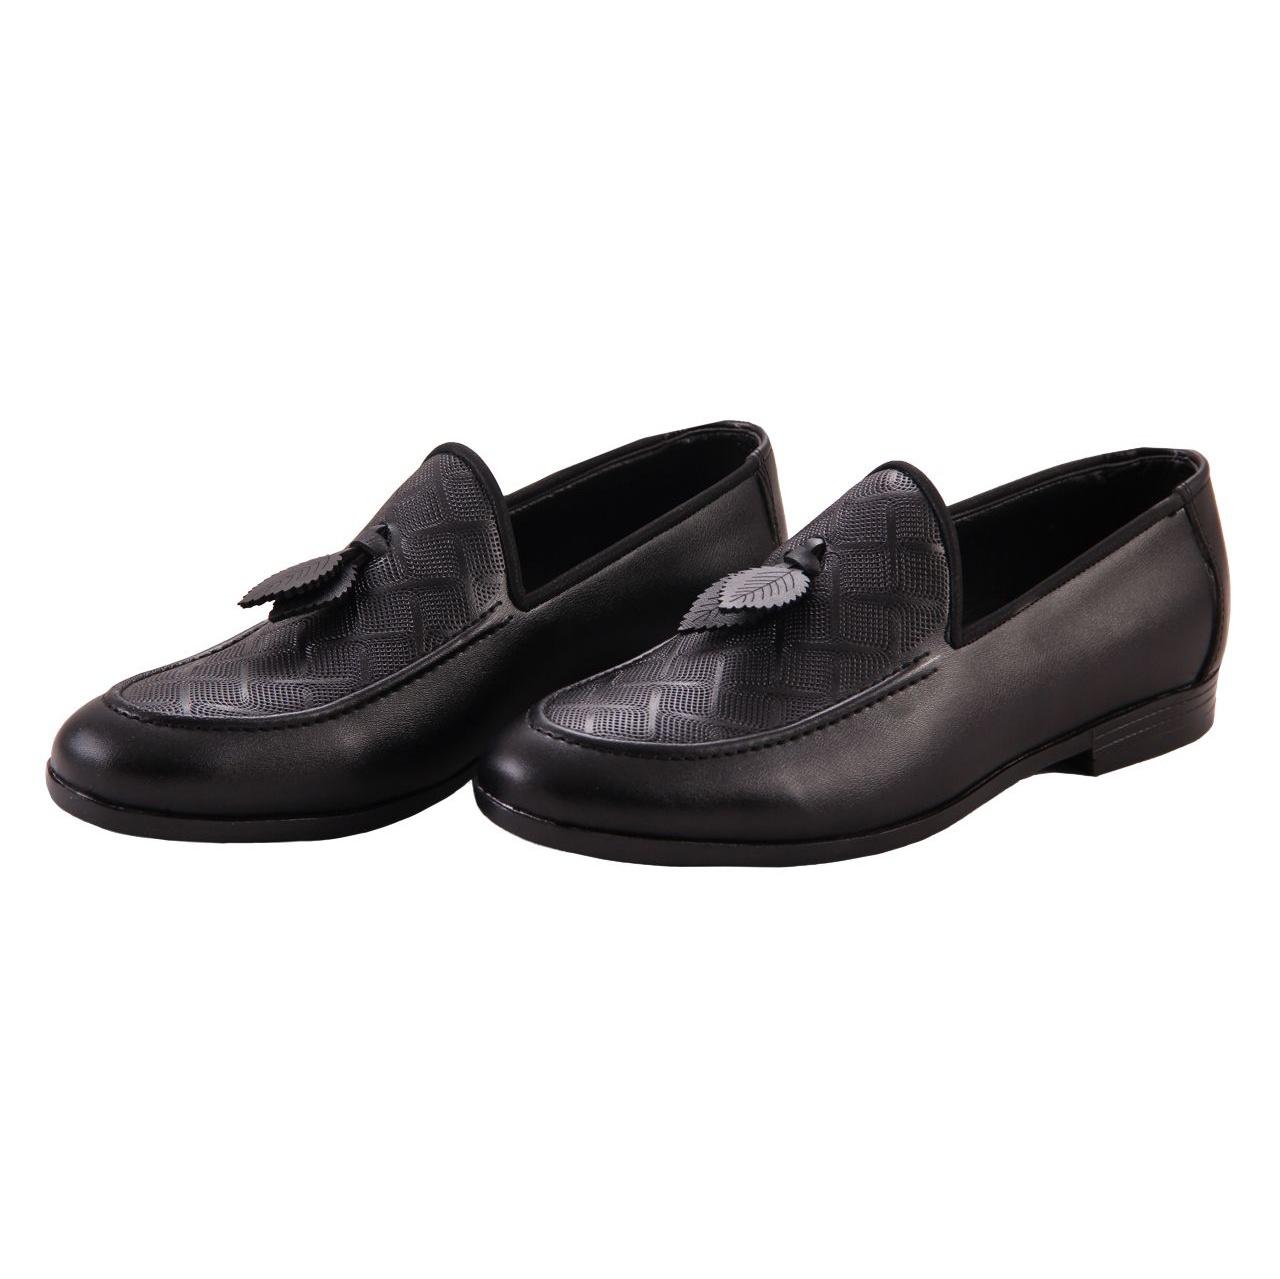 کفش مردانه مدل R28340-1 thumb 2 5